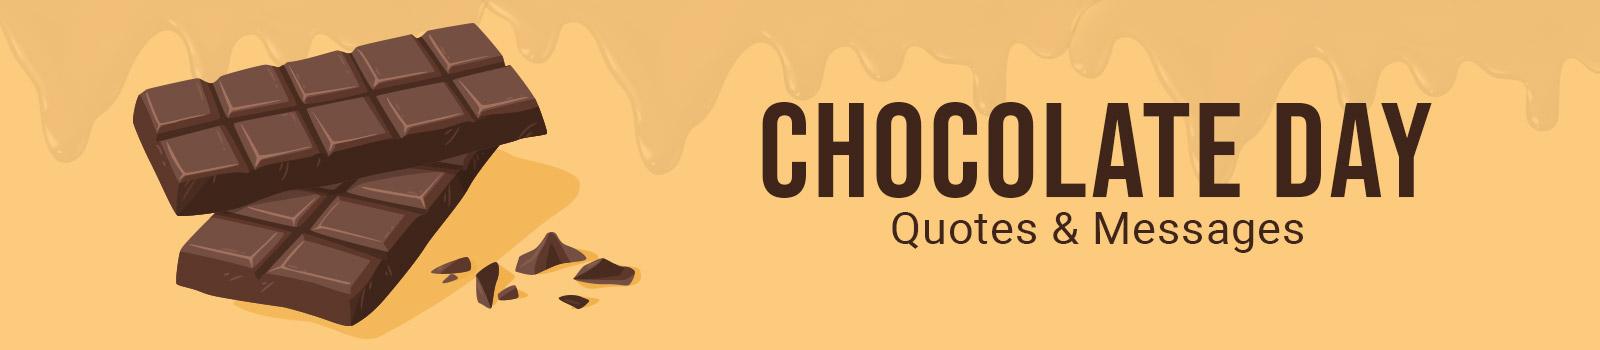 Chocolates Day